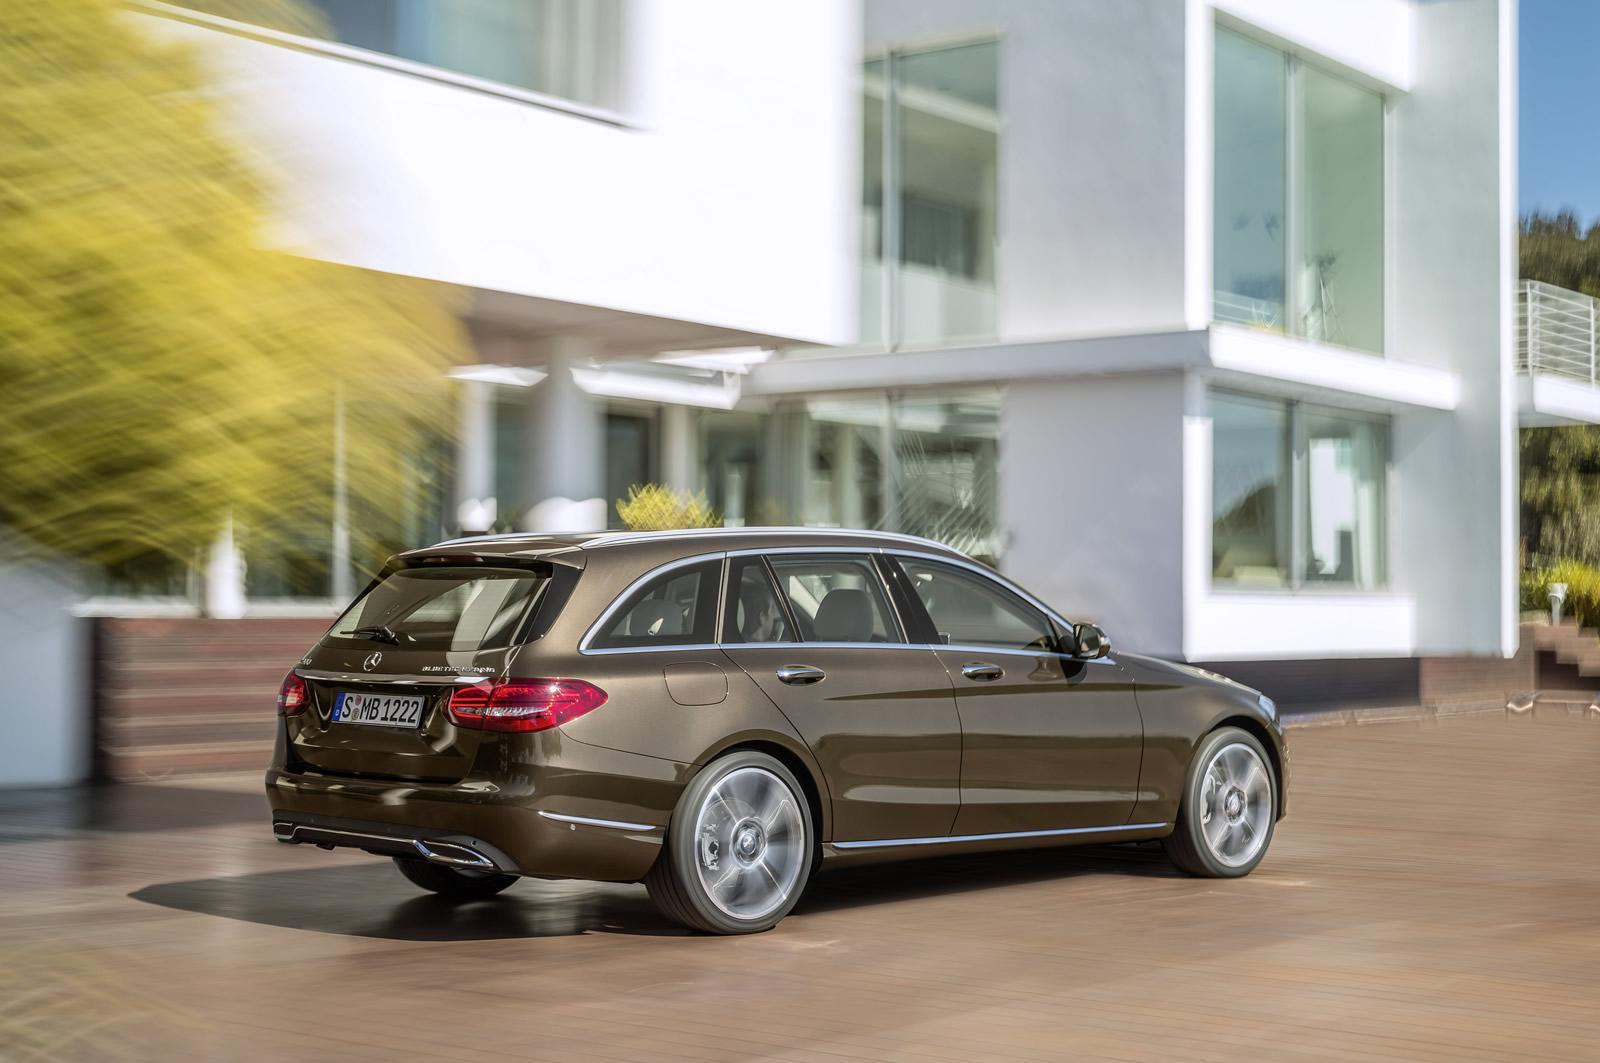 Foto de Mercedes-Benz Clase C Estate 2014 (12/36)